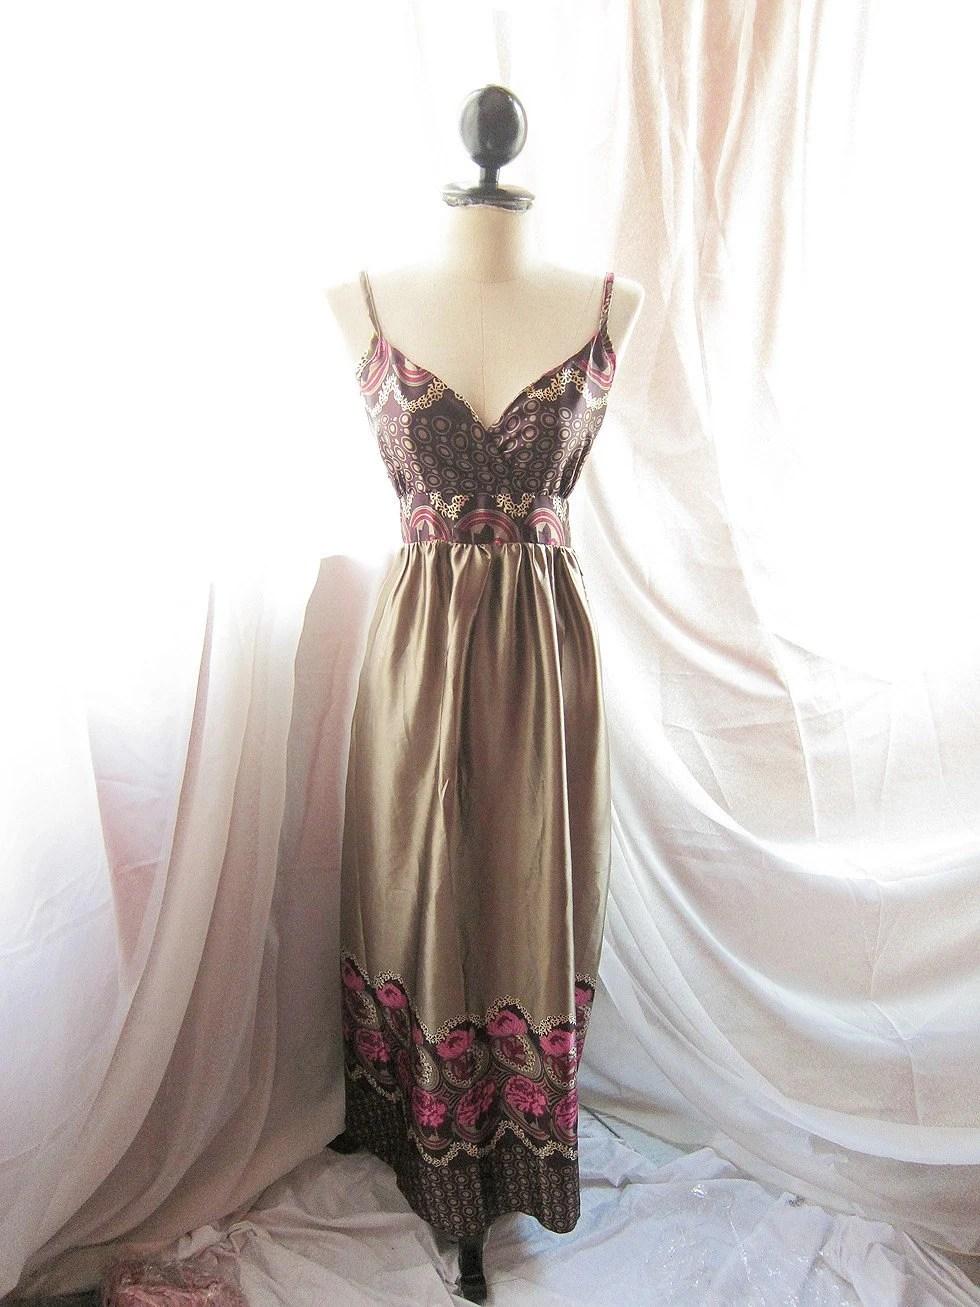 Seville Romance Venus Goddess Plum Peony Garland Motif Hippie Bohemian Dusty Olive Grayish Gold  Maxi Satin Dress Gown